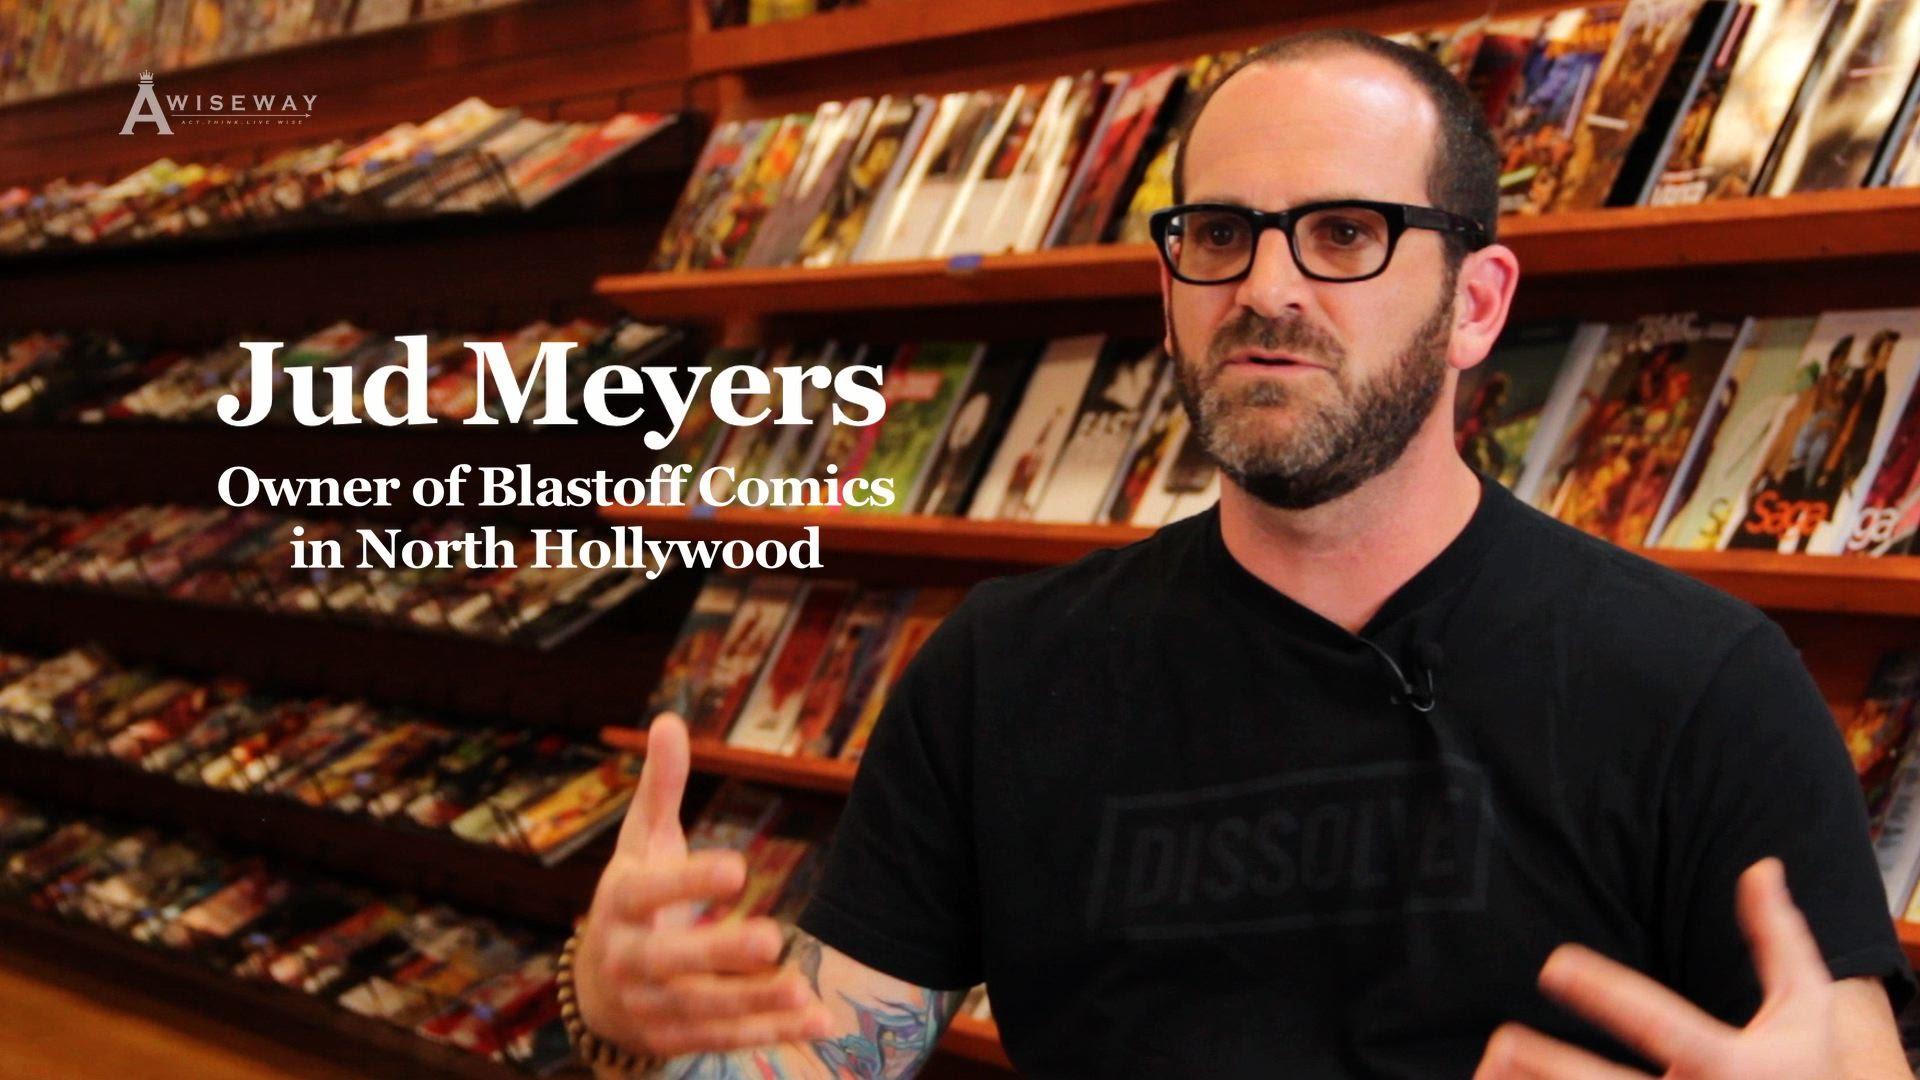 Blastoff Comics Owner, Jud Meyers Explains Choice on Superman vs Batman